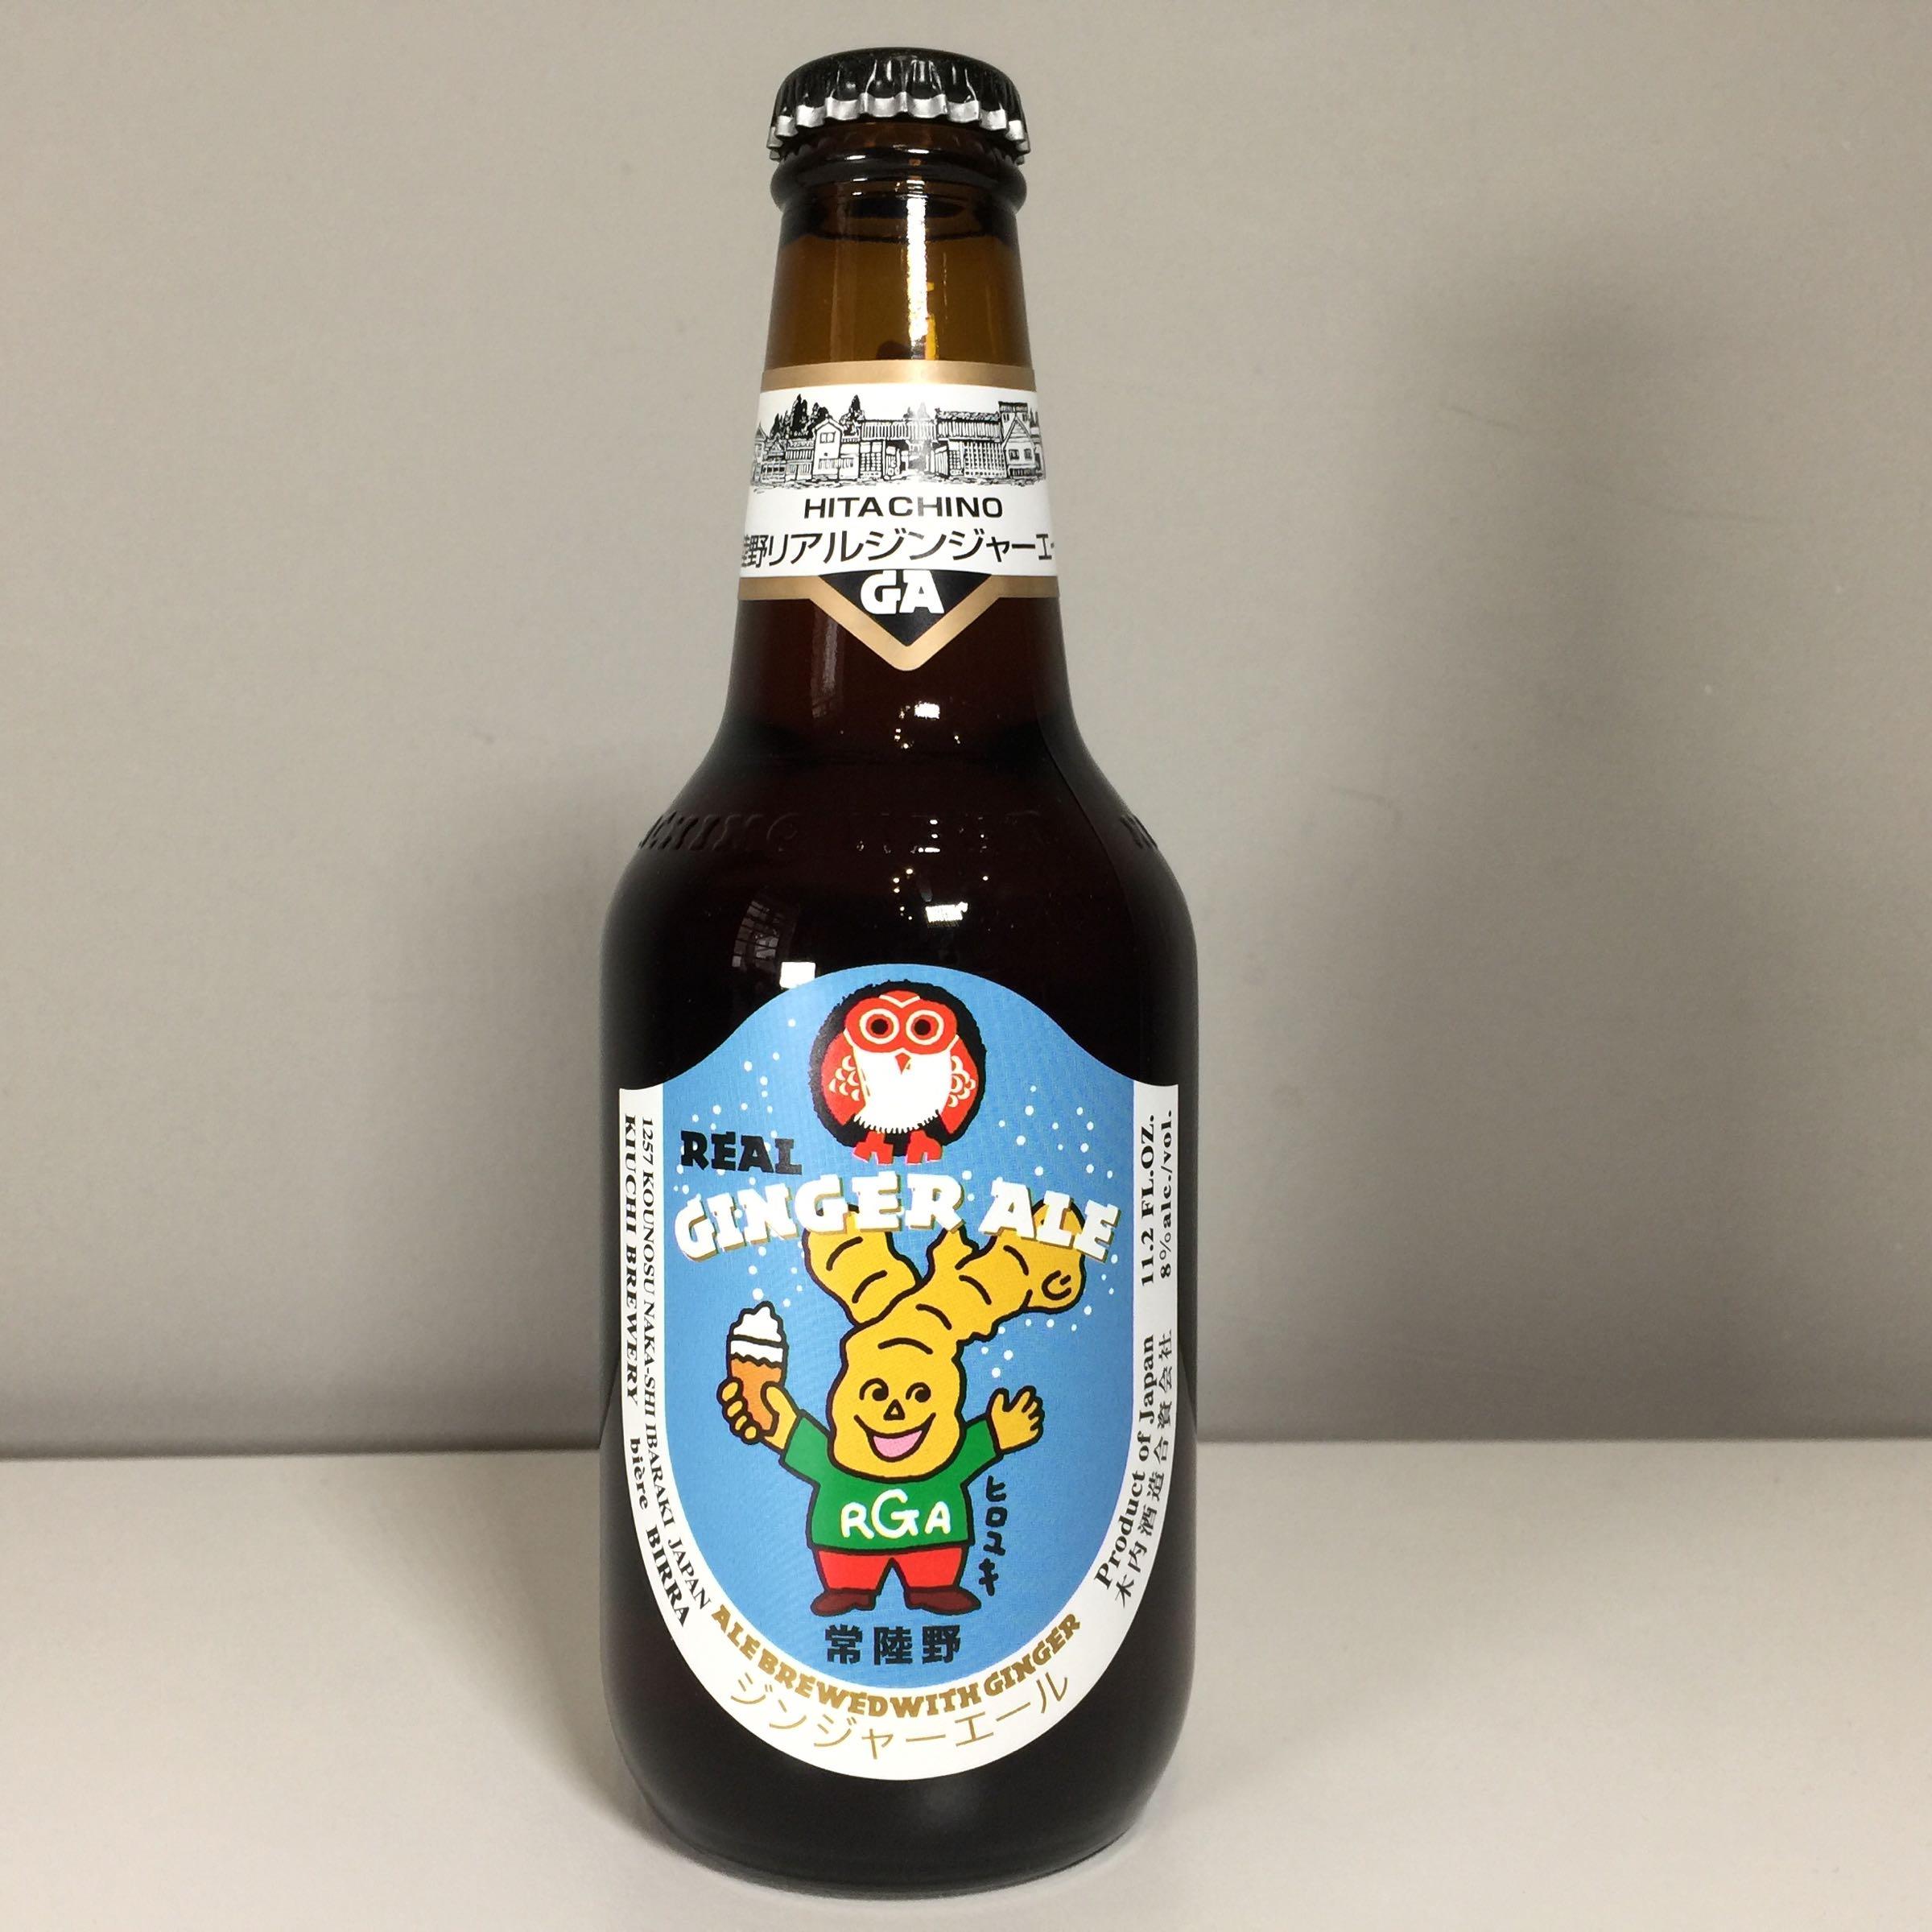 Hitachino Real  Ginger Ale